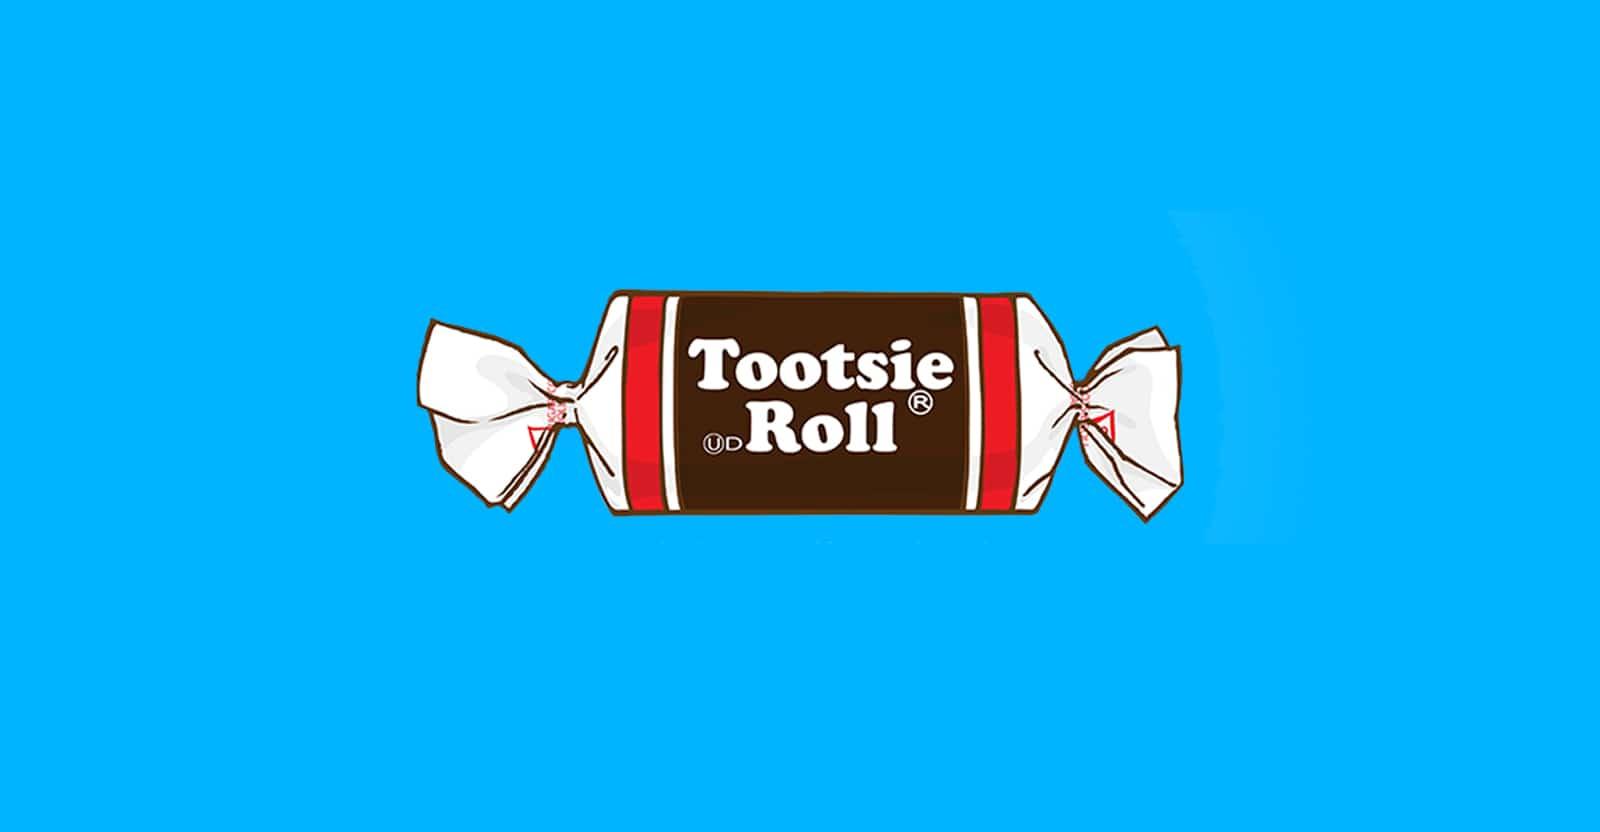 are tootsie rolls gluten-free